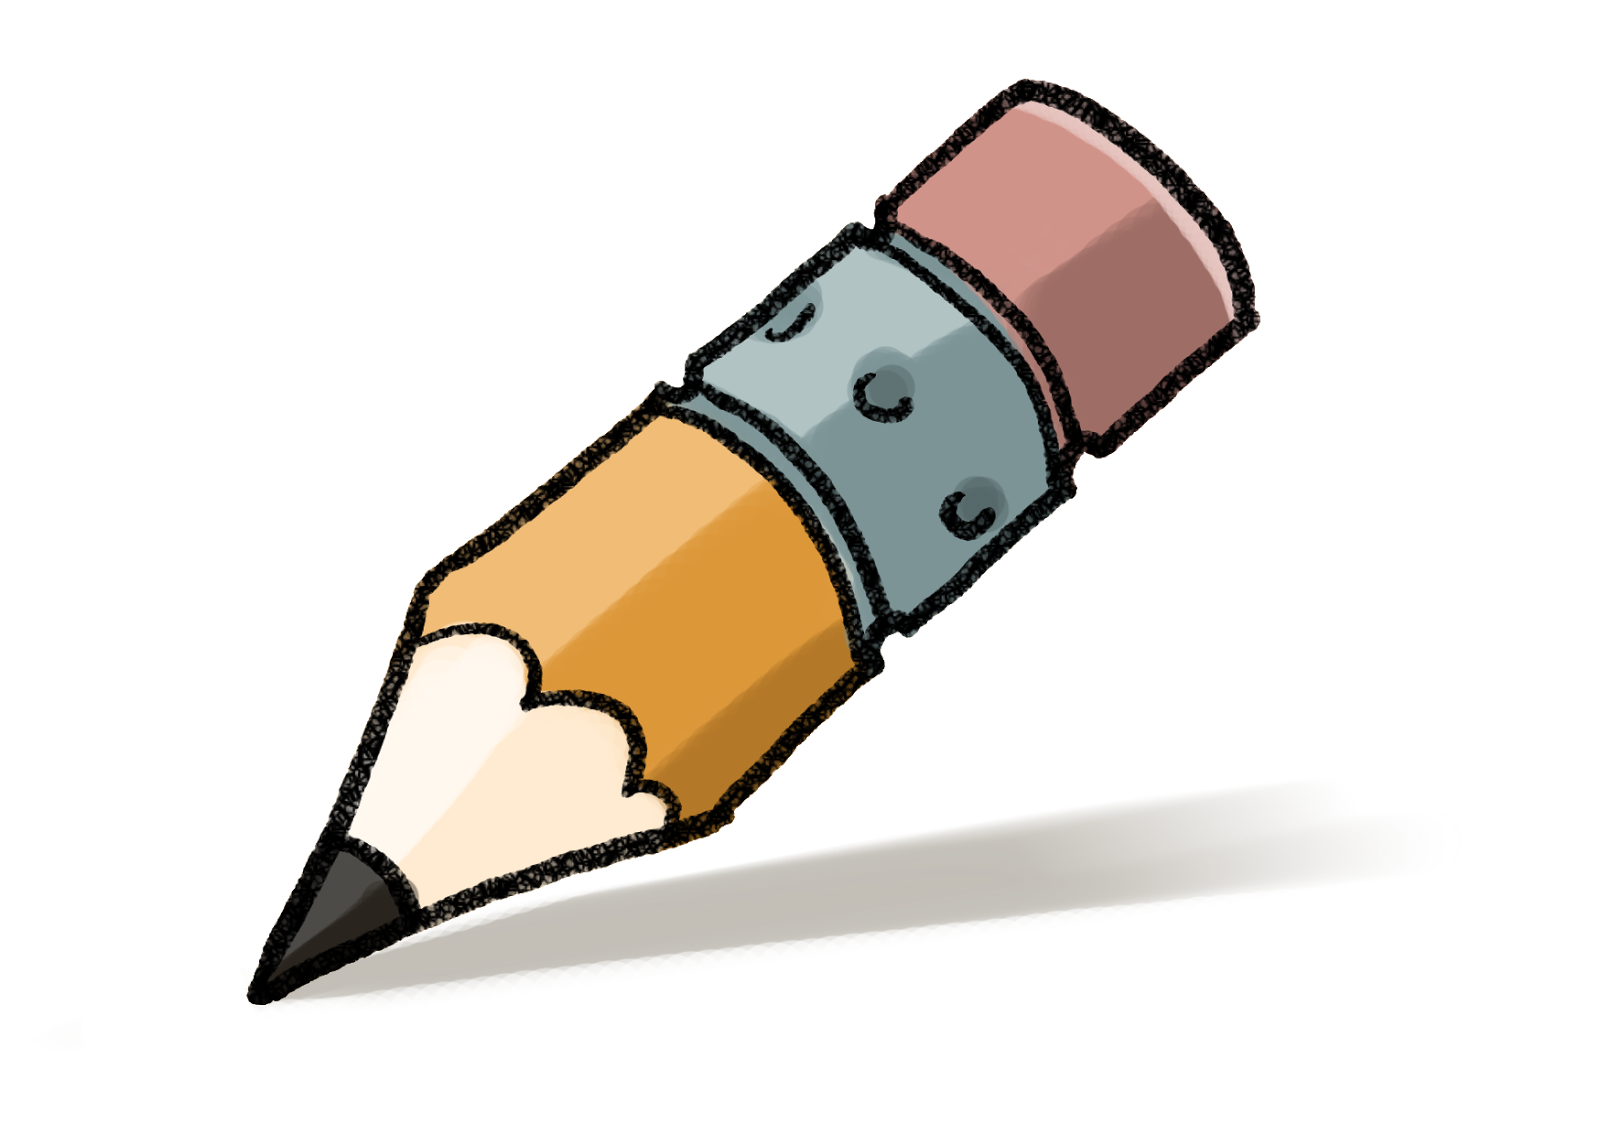 Animators 2012: Animation Scripting and Methods - 604